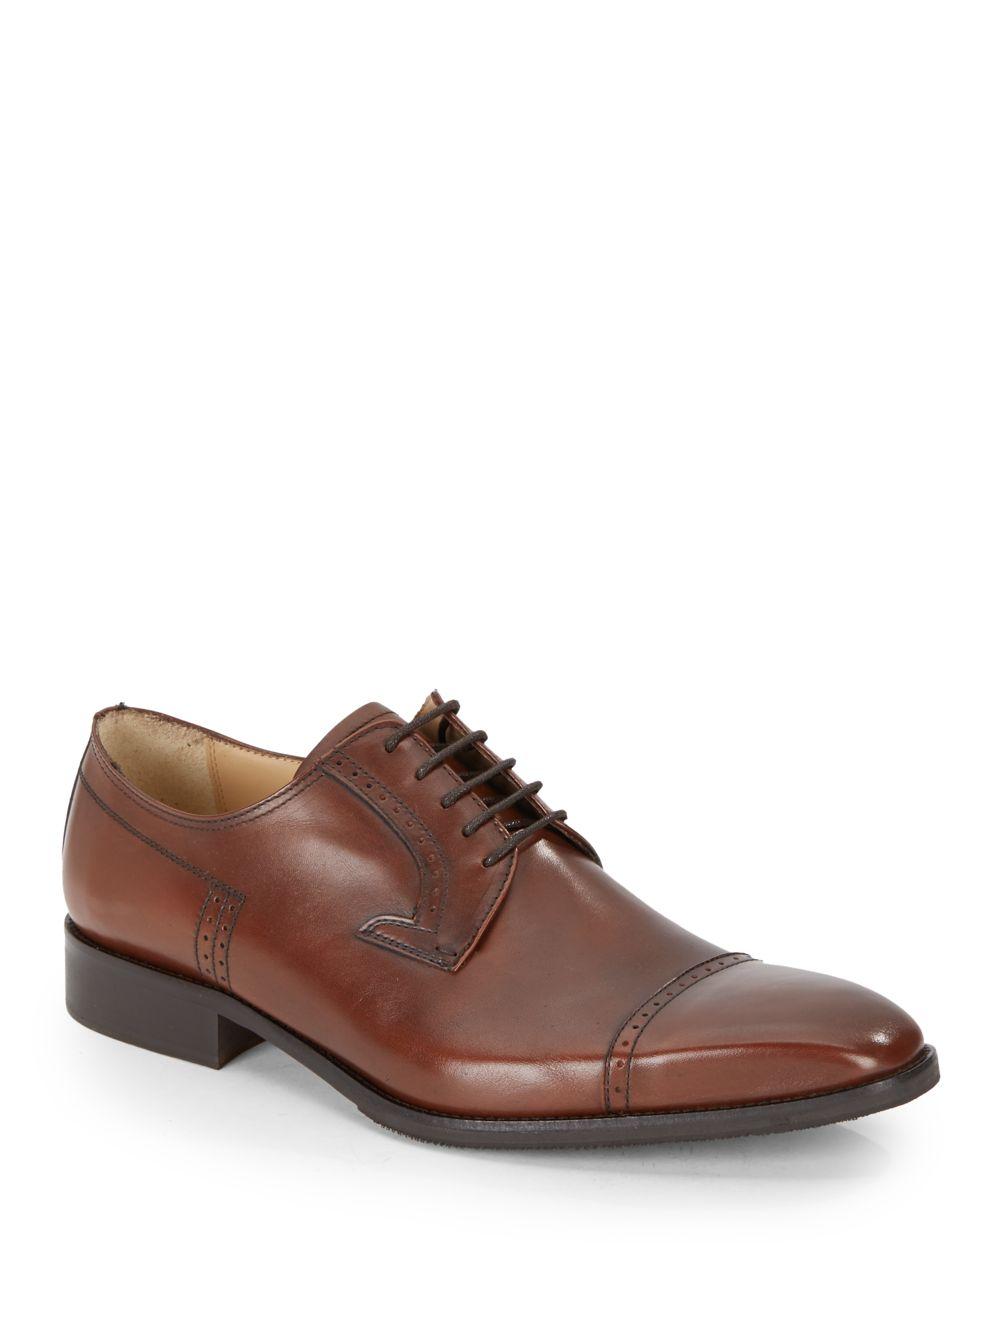 Saks Fifth Avenue Black Oxford Shoes